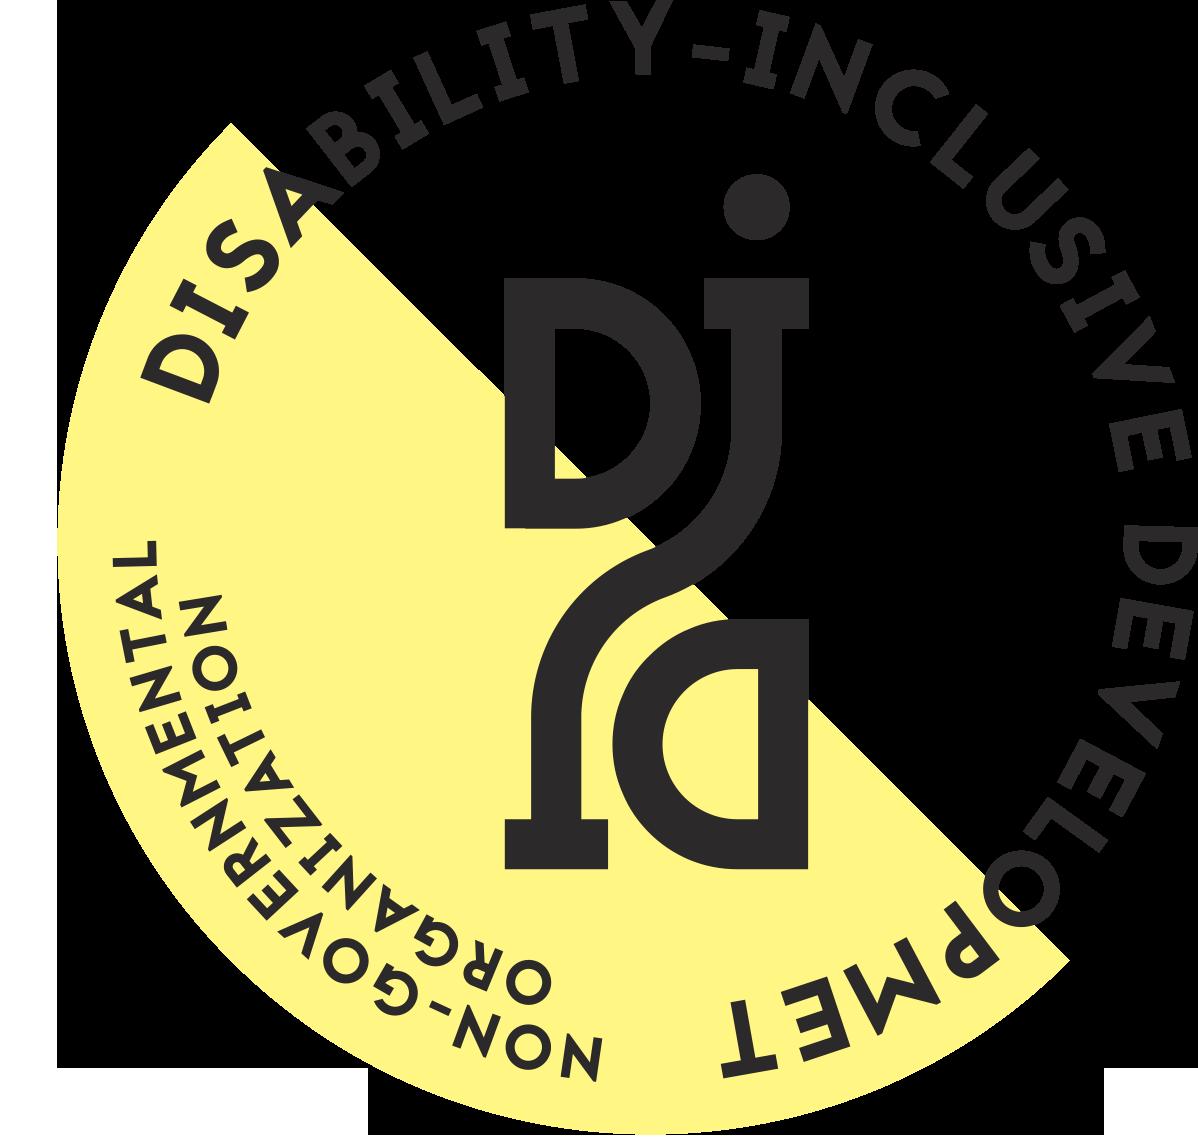 Disability-inclusive development